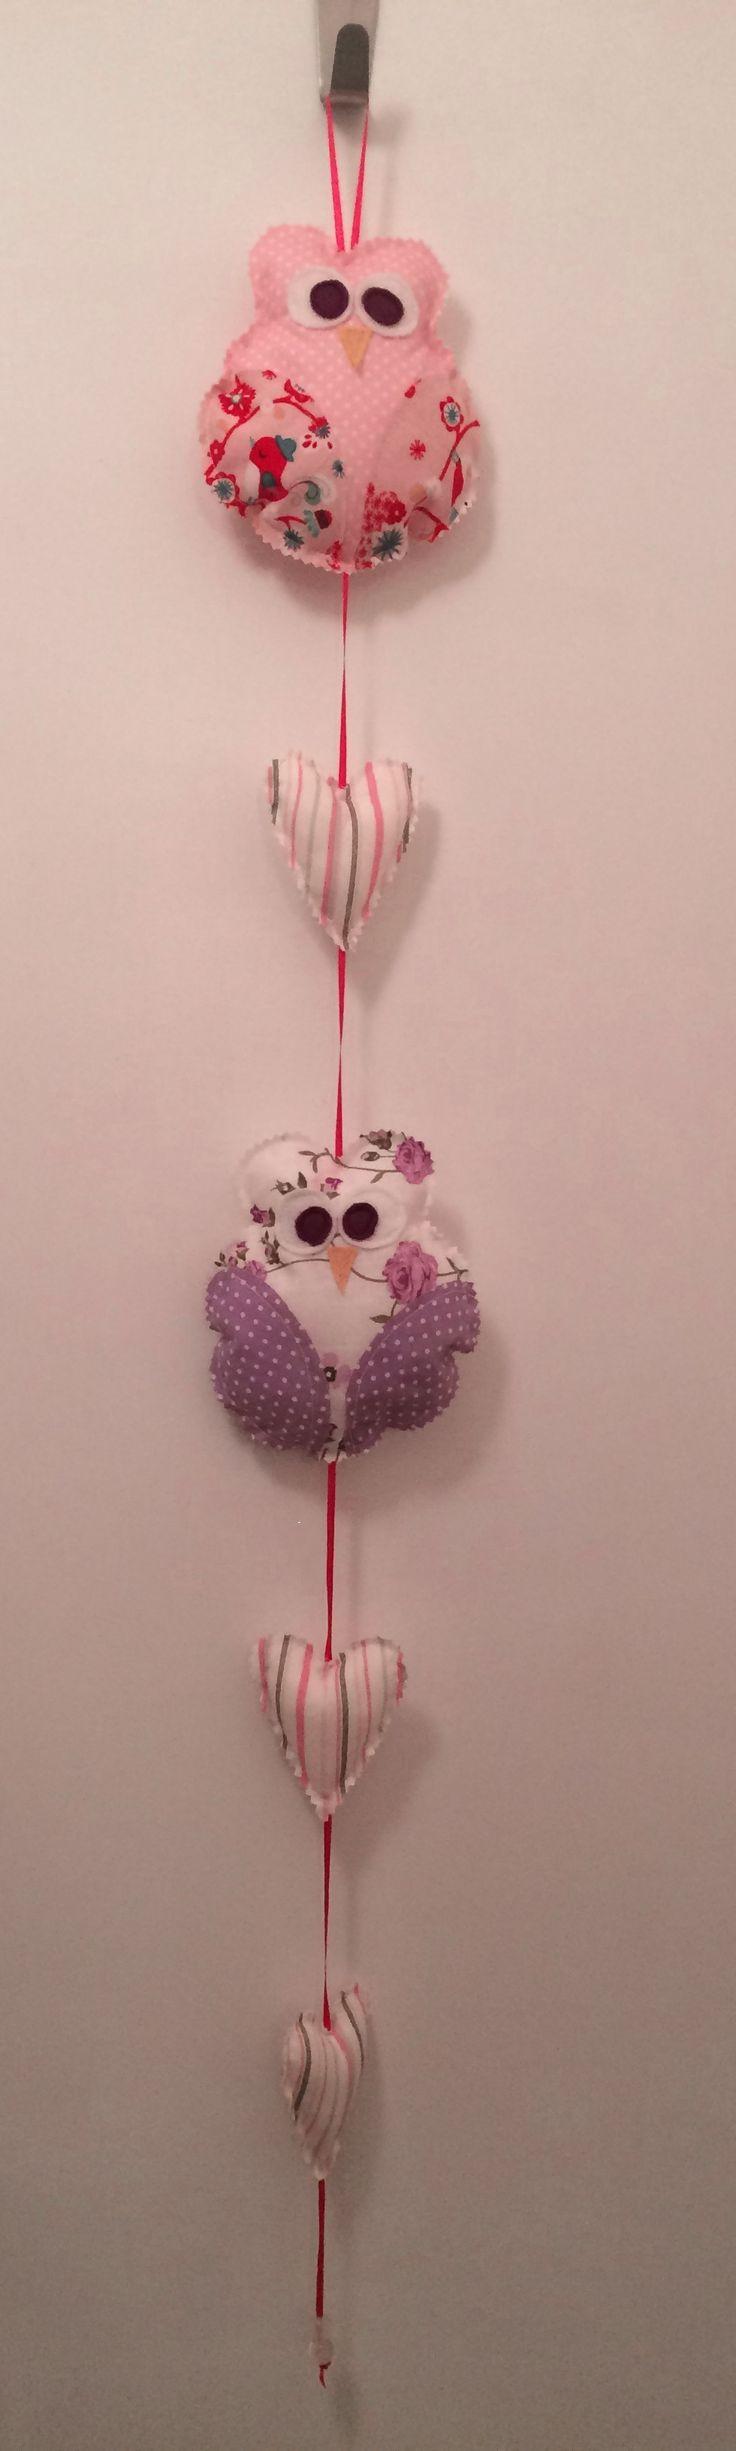 Owl and hearts, handmade garland for a kids room or playroom or nursery #fabricowls #fabrichearts #handmadegarland #kidstuff #kidsroomdeco #kidsmobile #nurserydeco #almanogr